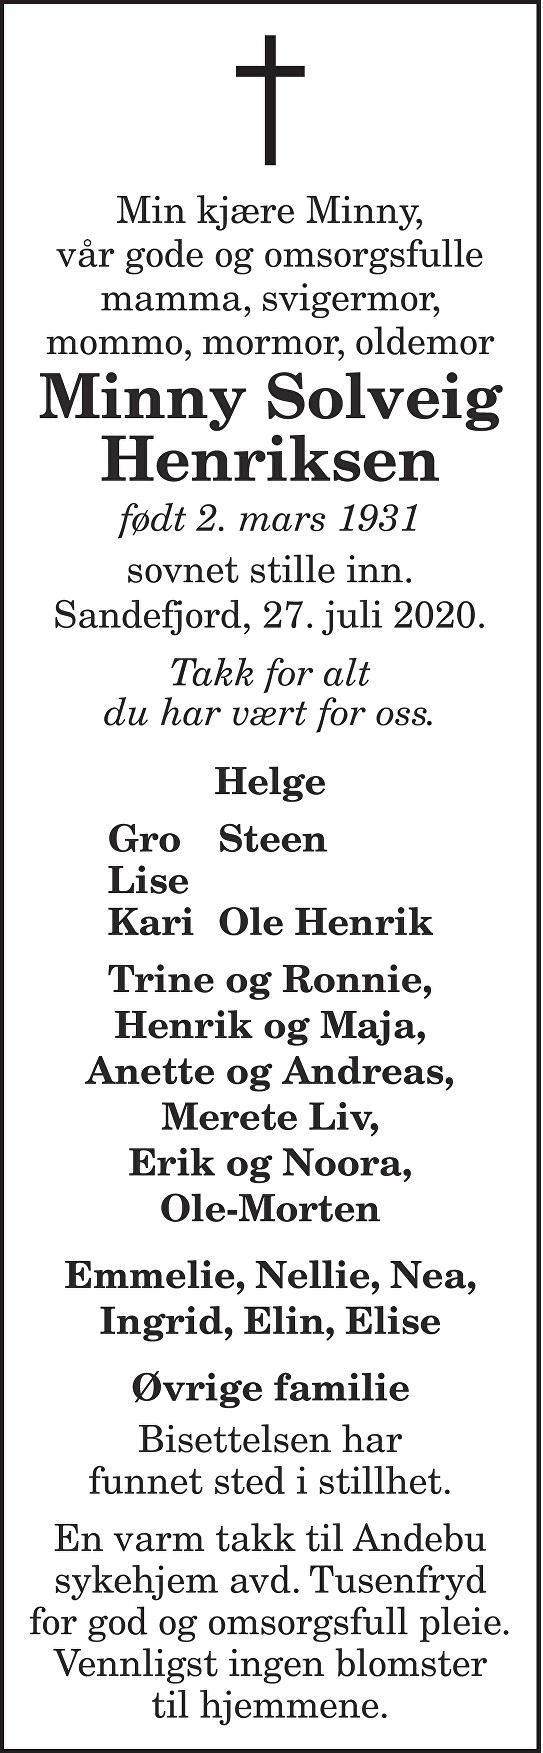 Minny Solveig Henriksen Dødsannonse